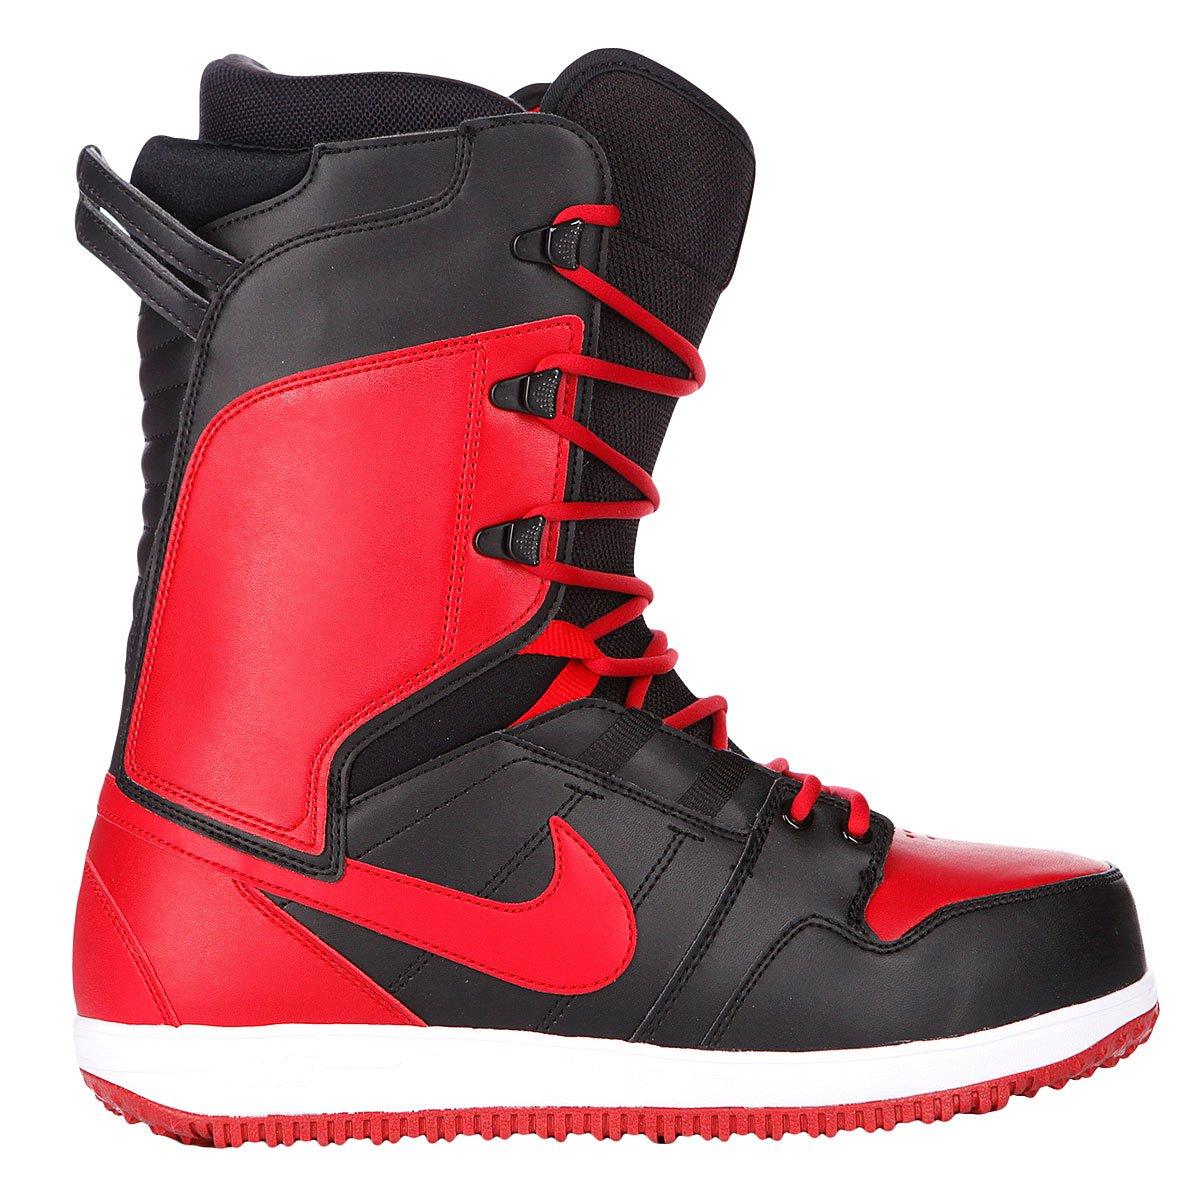 aa5feb53 Купить ботинки для сноуборда Nike Vapen Black/Varsity Red (447125 ...